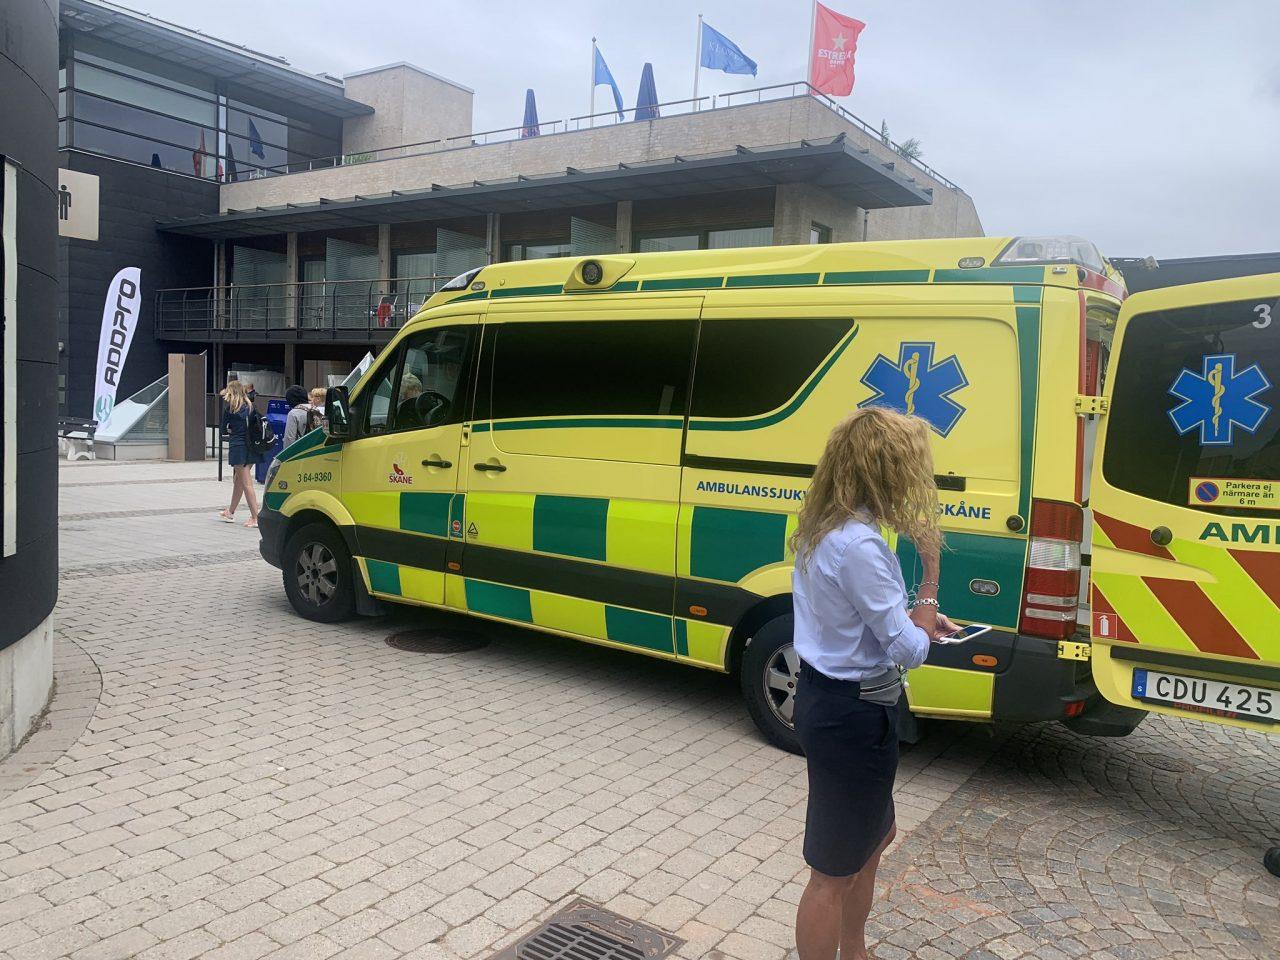 ambulancia mareo lucas campagnolo octavos masculinos-cuadro-masculino-swedish-open-2019